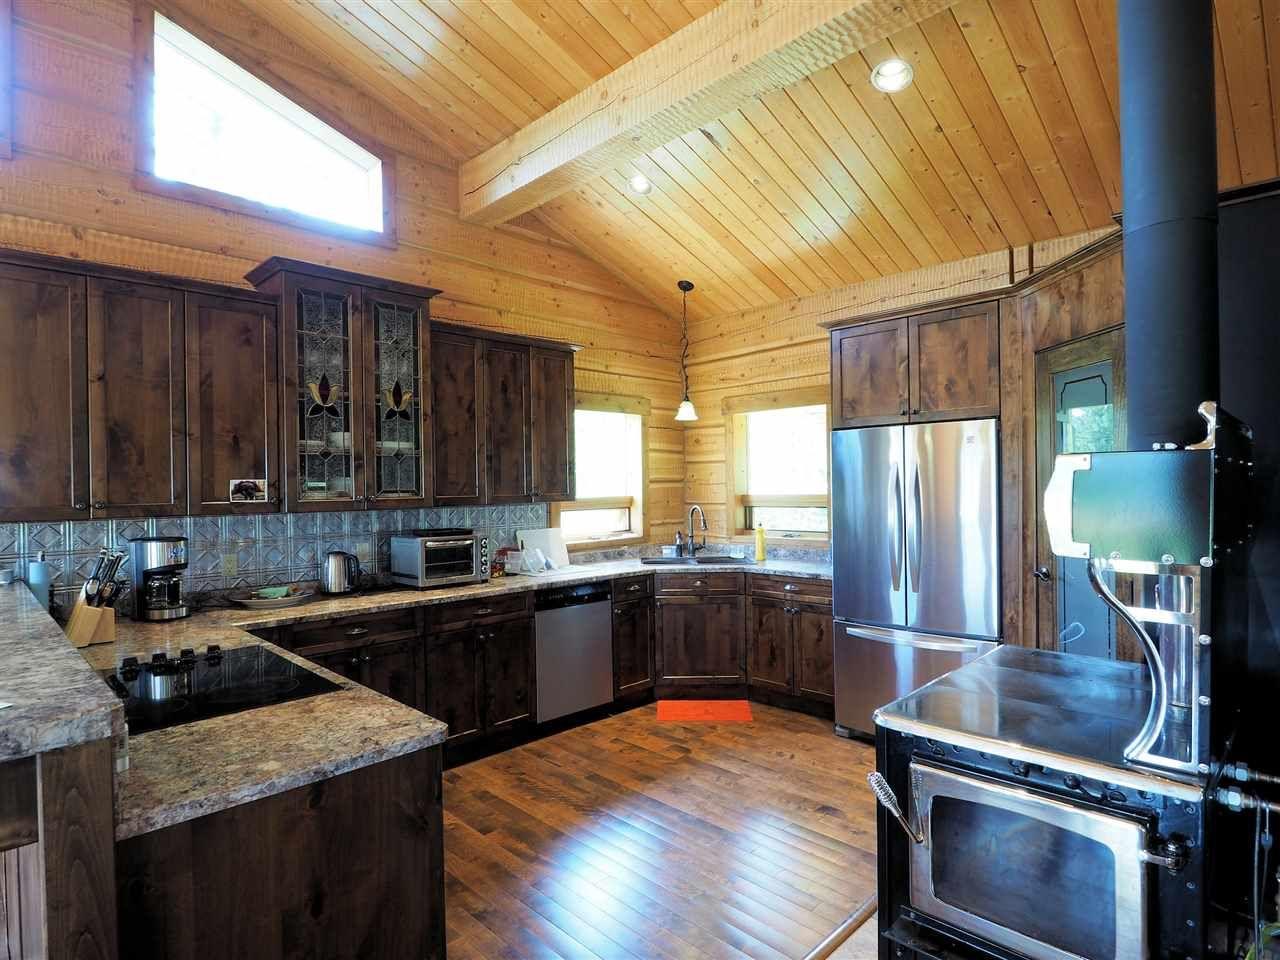 Photo 9: Photos: 4050 CANIM-HENDRIX LAKE Road in Canim Lake: Canim/Mahood Lake House for sale (100 Mile House (Zone 10))  : MLS®# R2396282